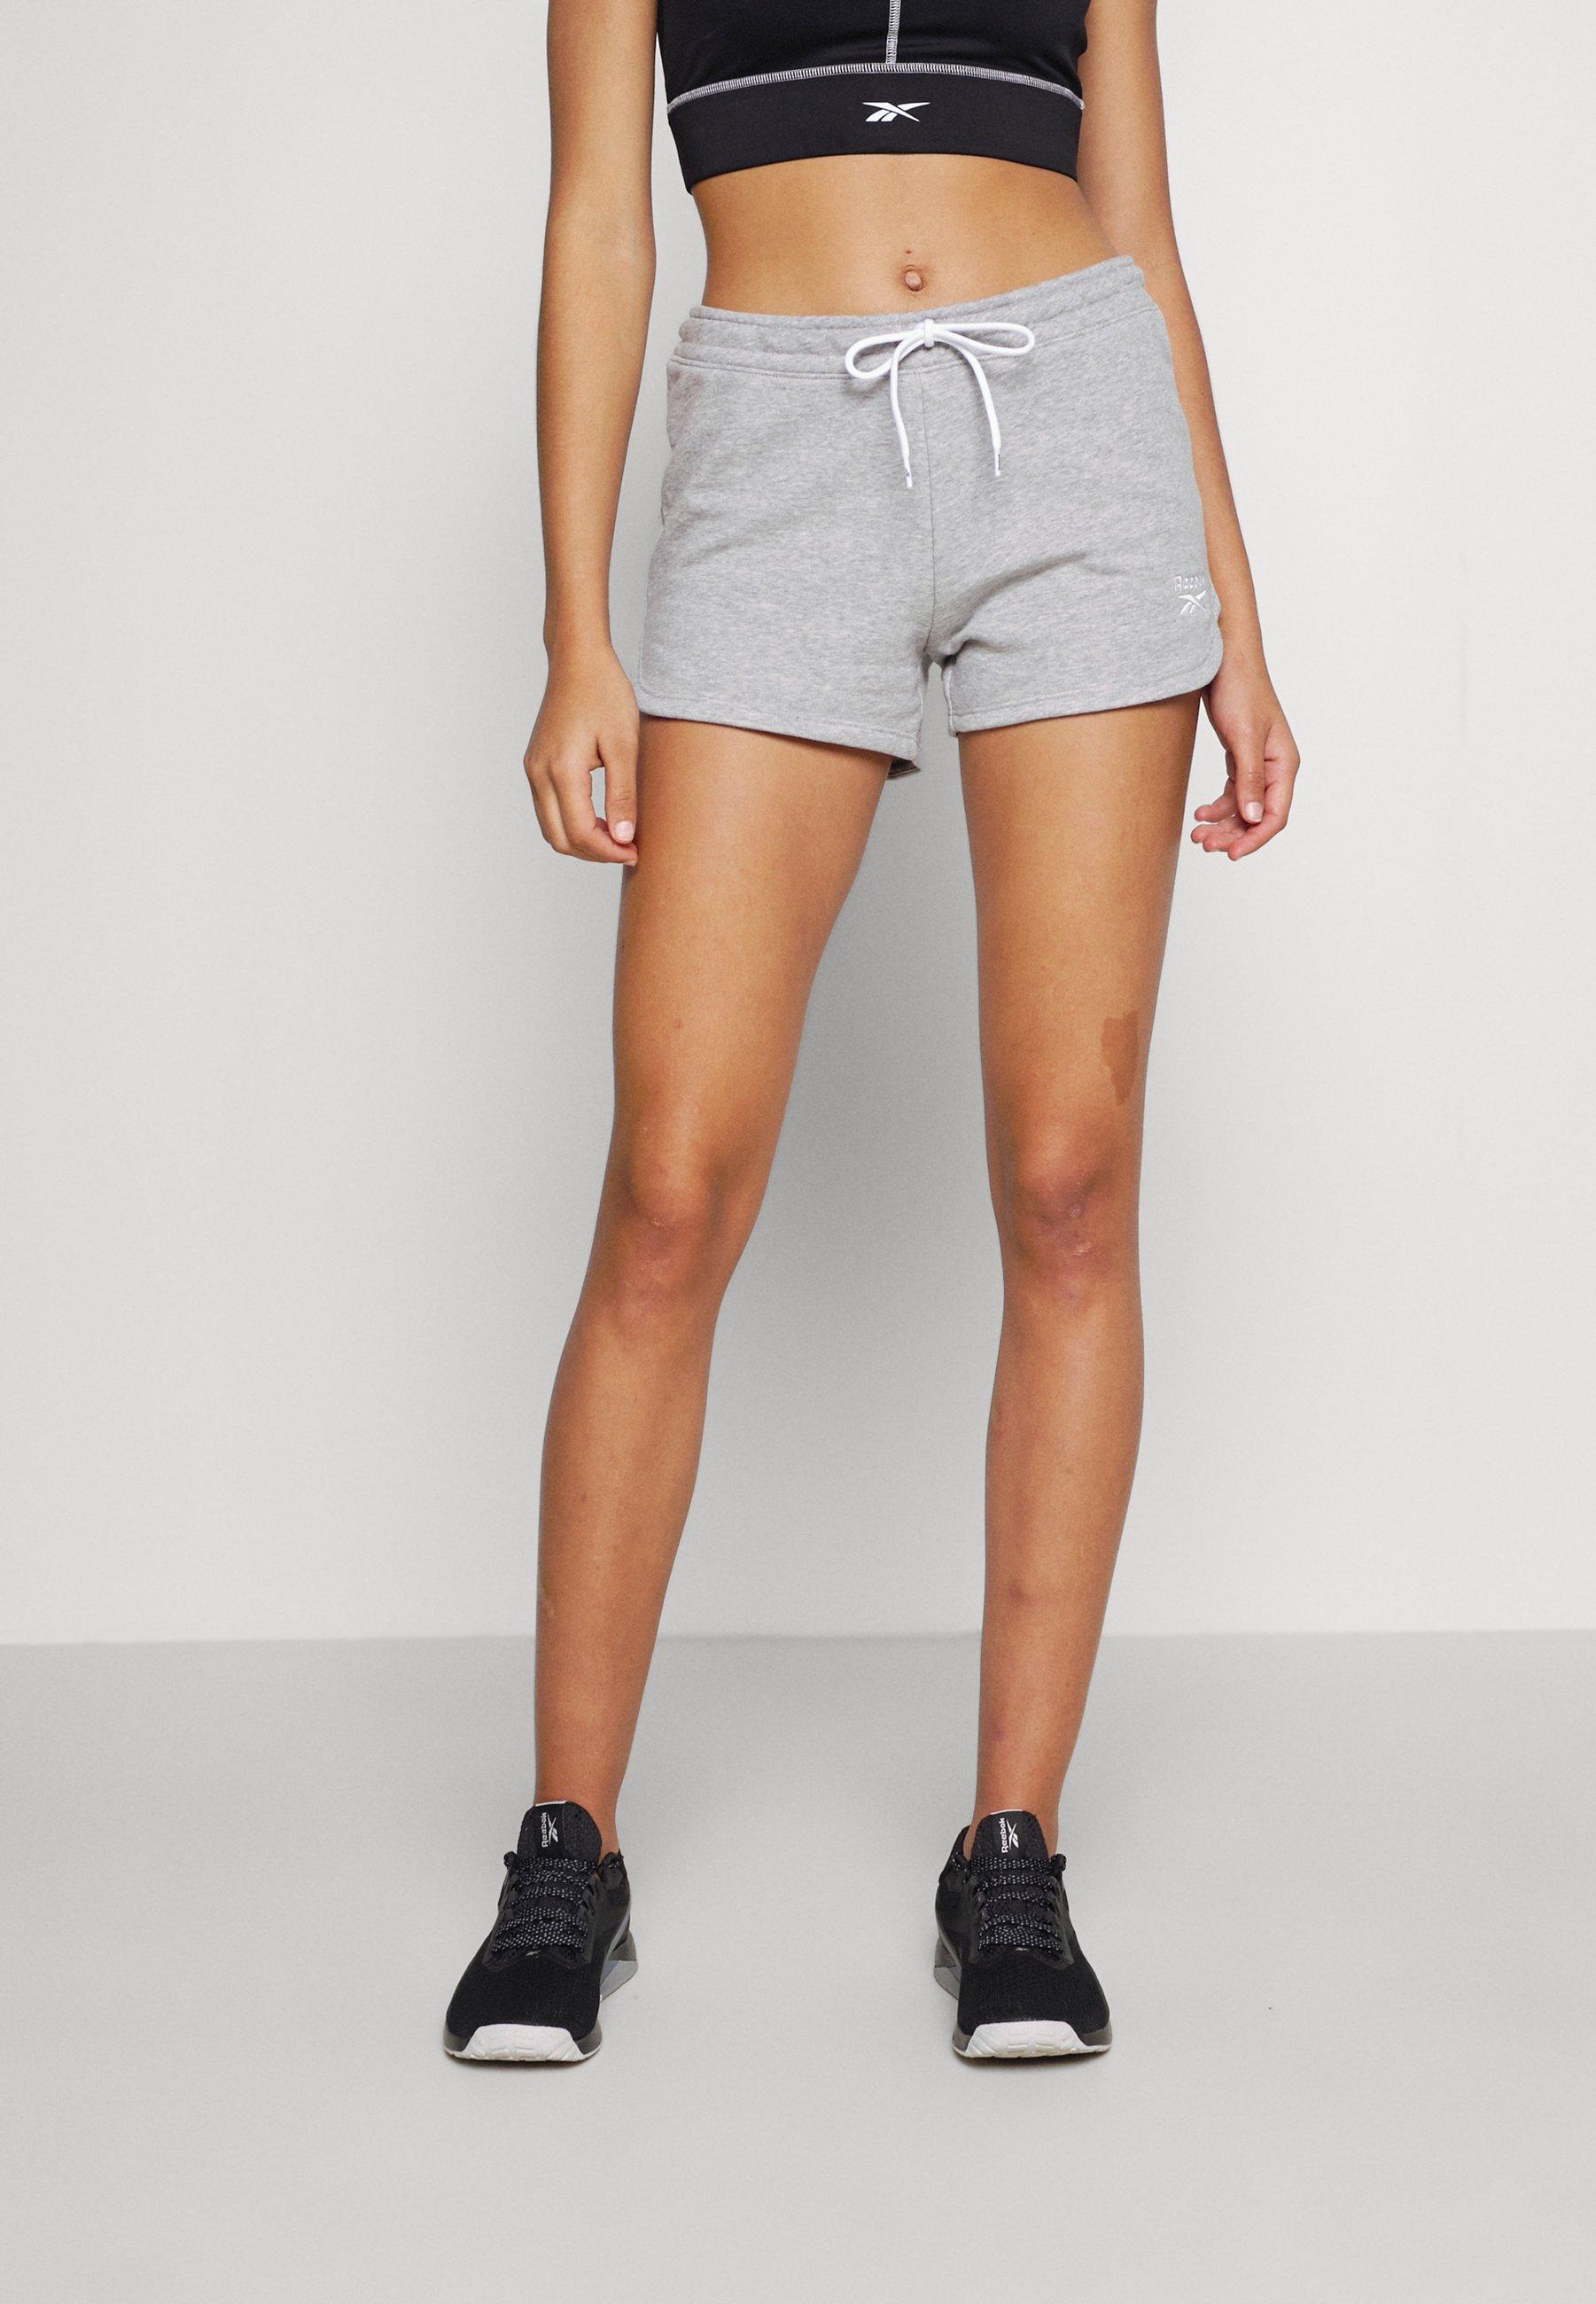 Damen FRENCH TERRY SHORT - kurze Sporthose